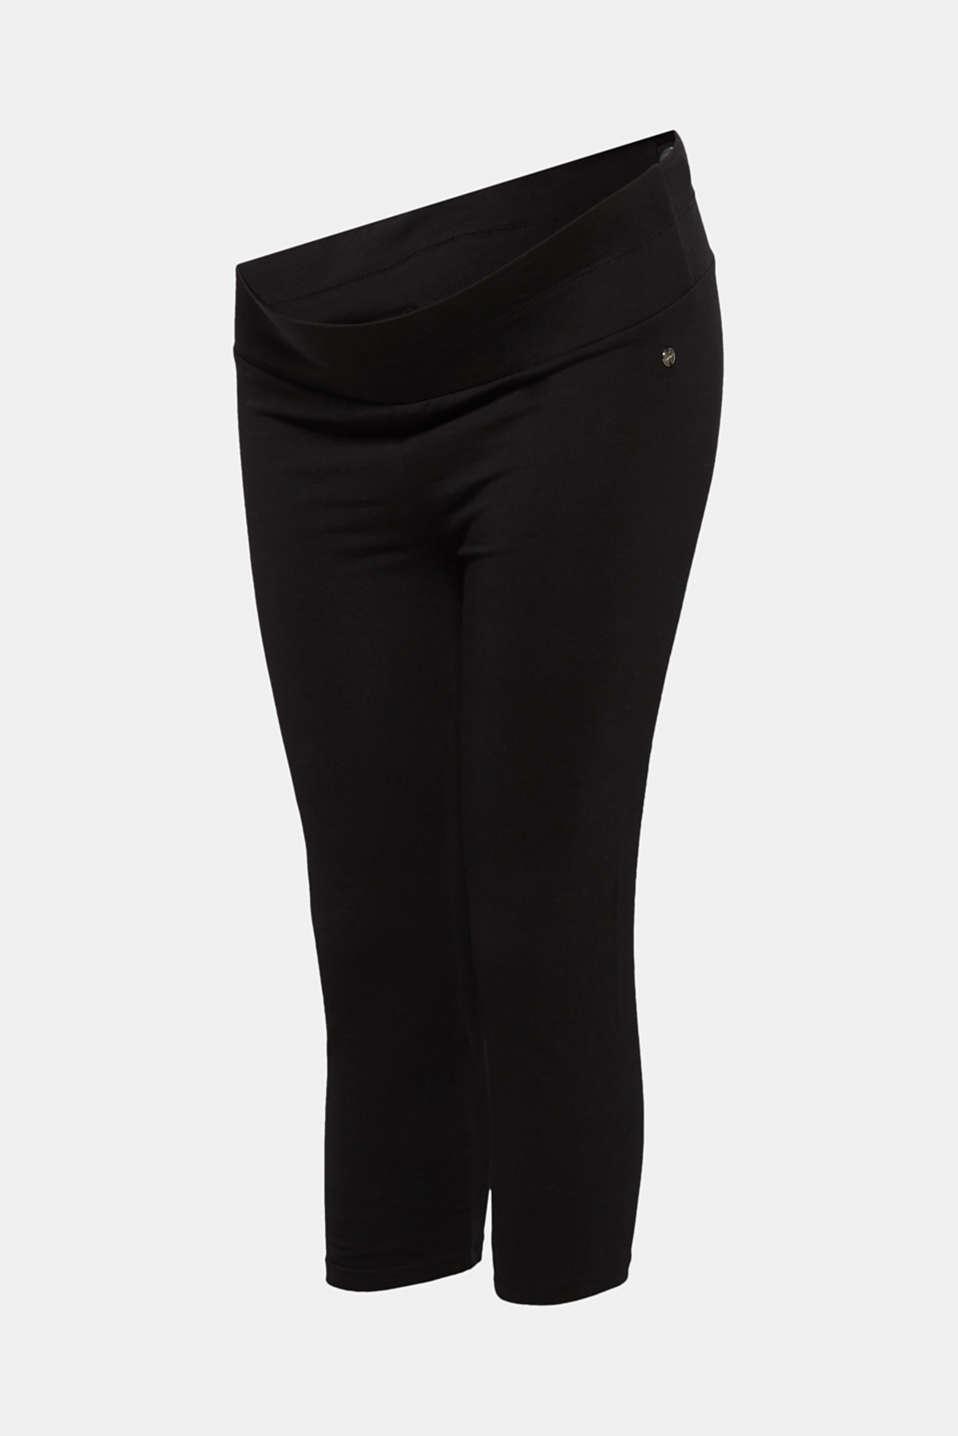 Leggings, LCBLACK, detail image number 2